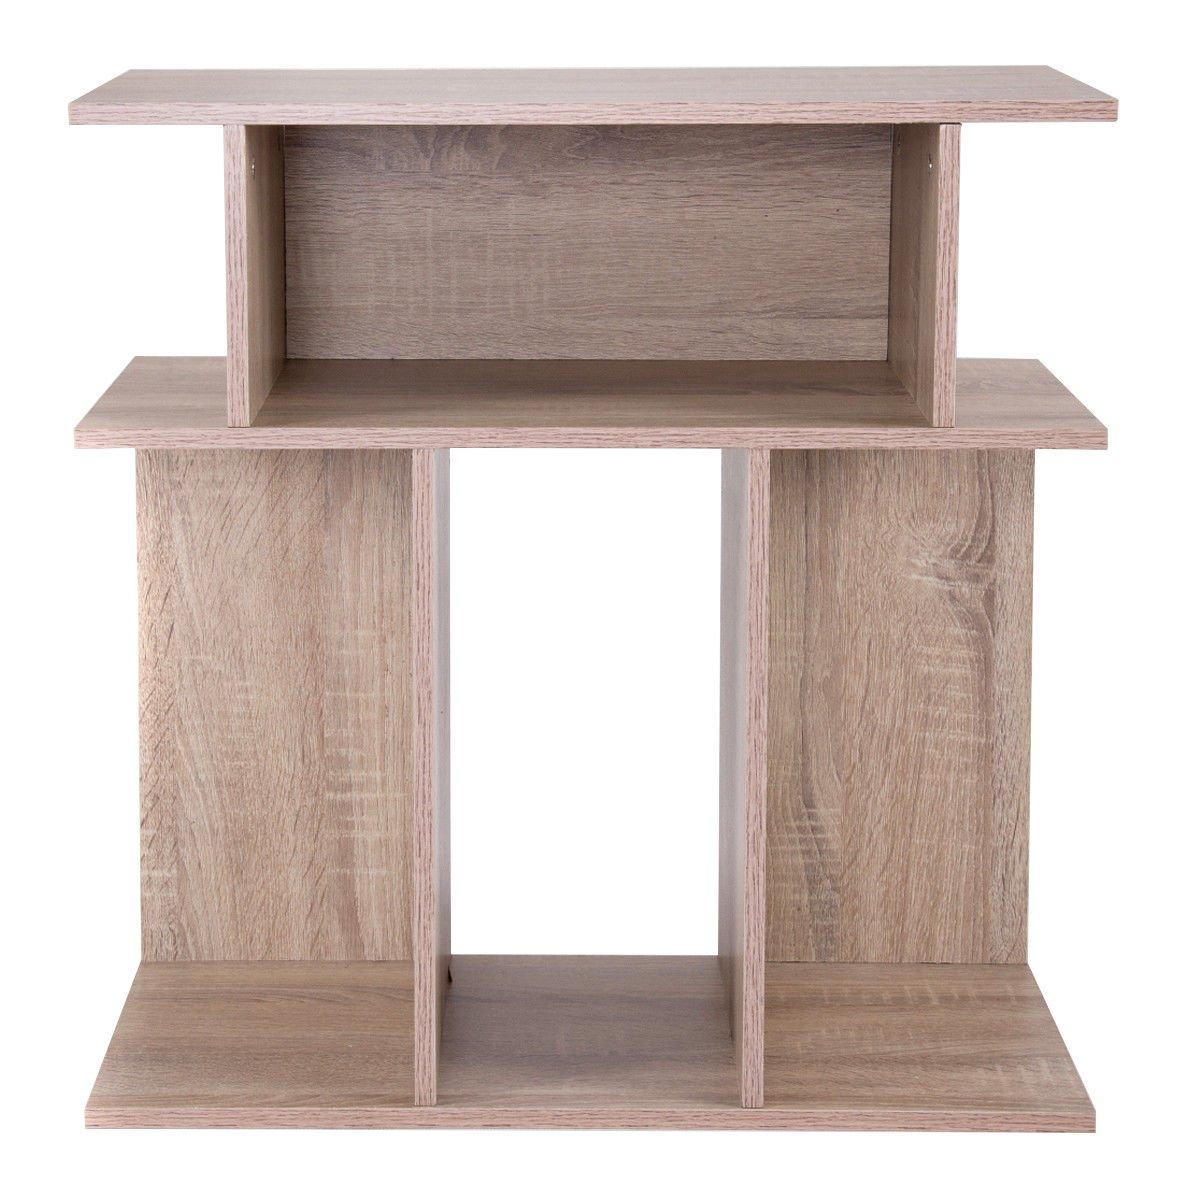 GHP Home/Office 23.6'' Lx11.8 Dx24 H Multipurpose Durable Rectangular Modern Side Table